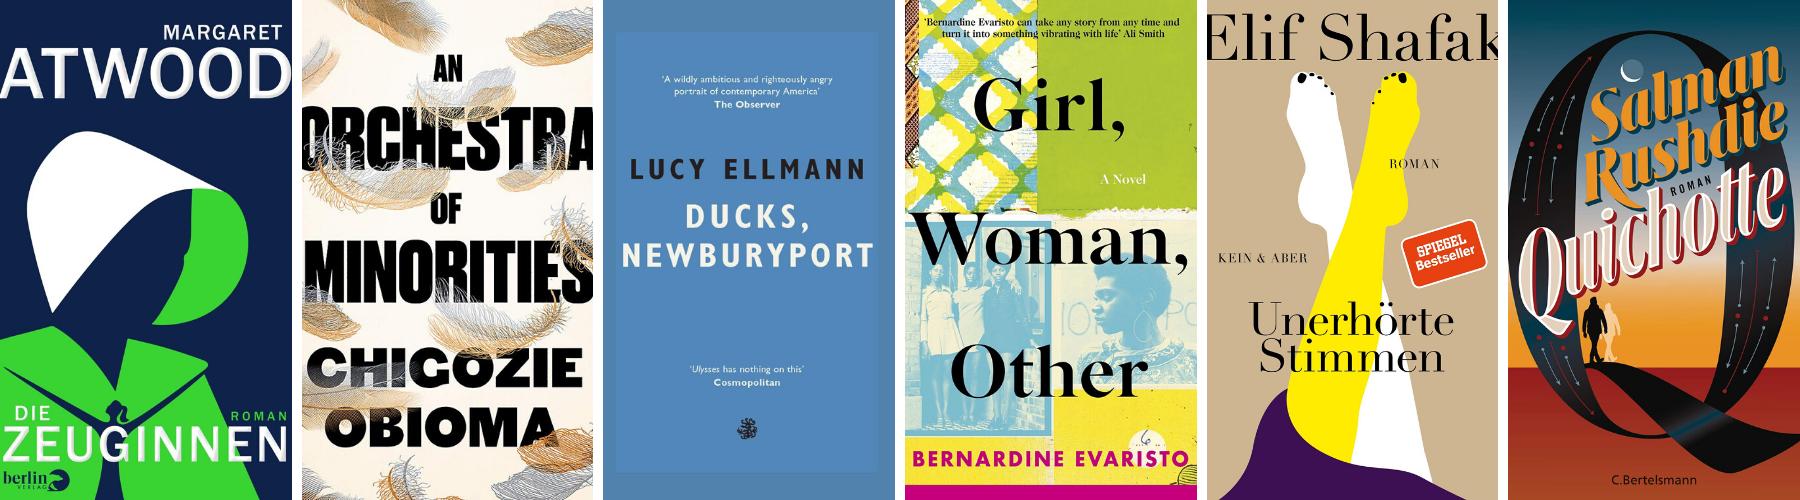 Booker Prize 2019 - Shortlist(4)